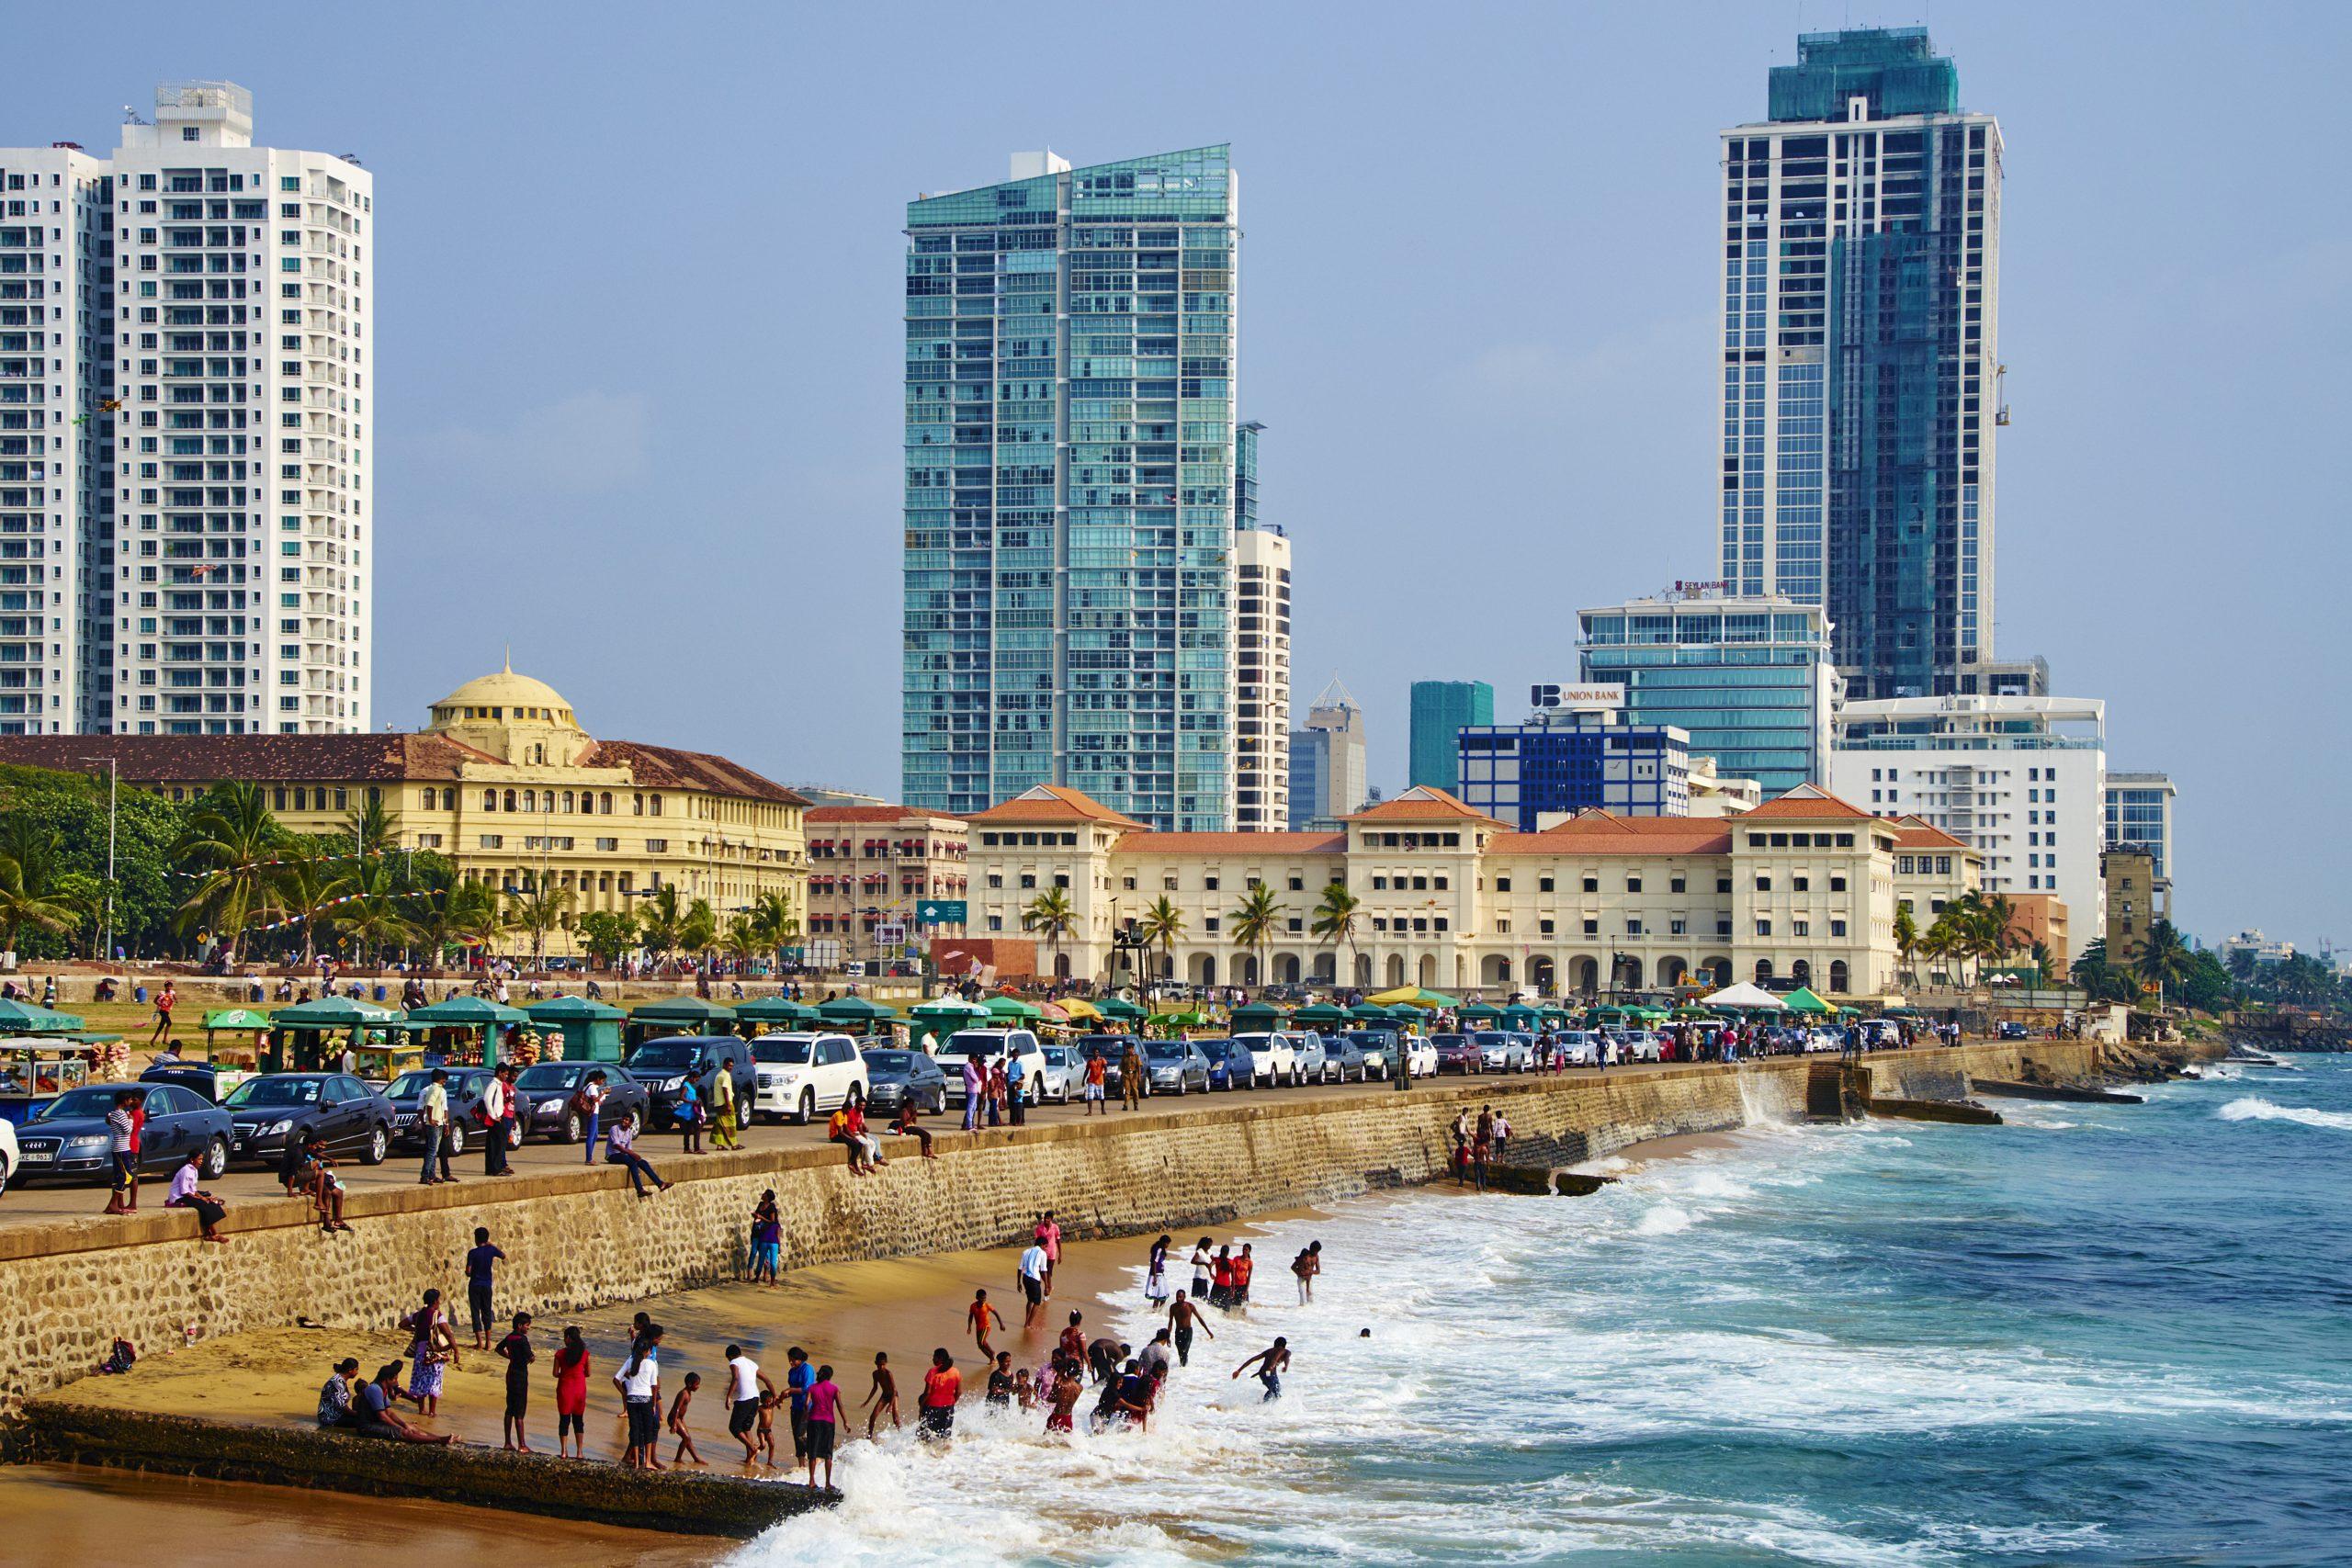 Sri Lanka, Colombo, Galle Face Beach